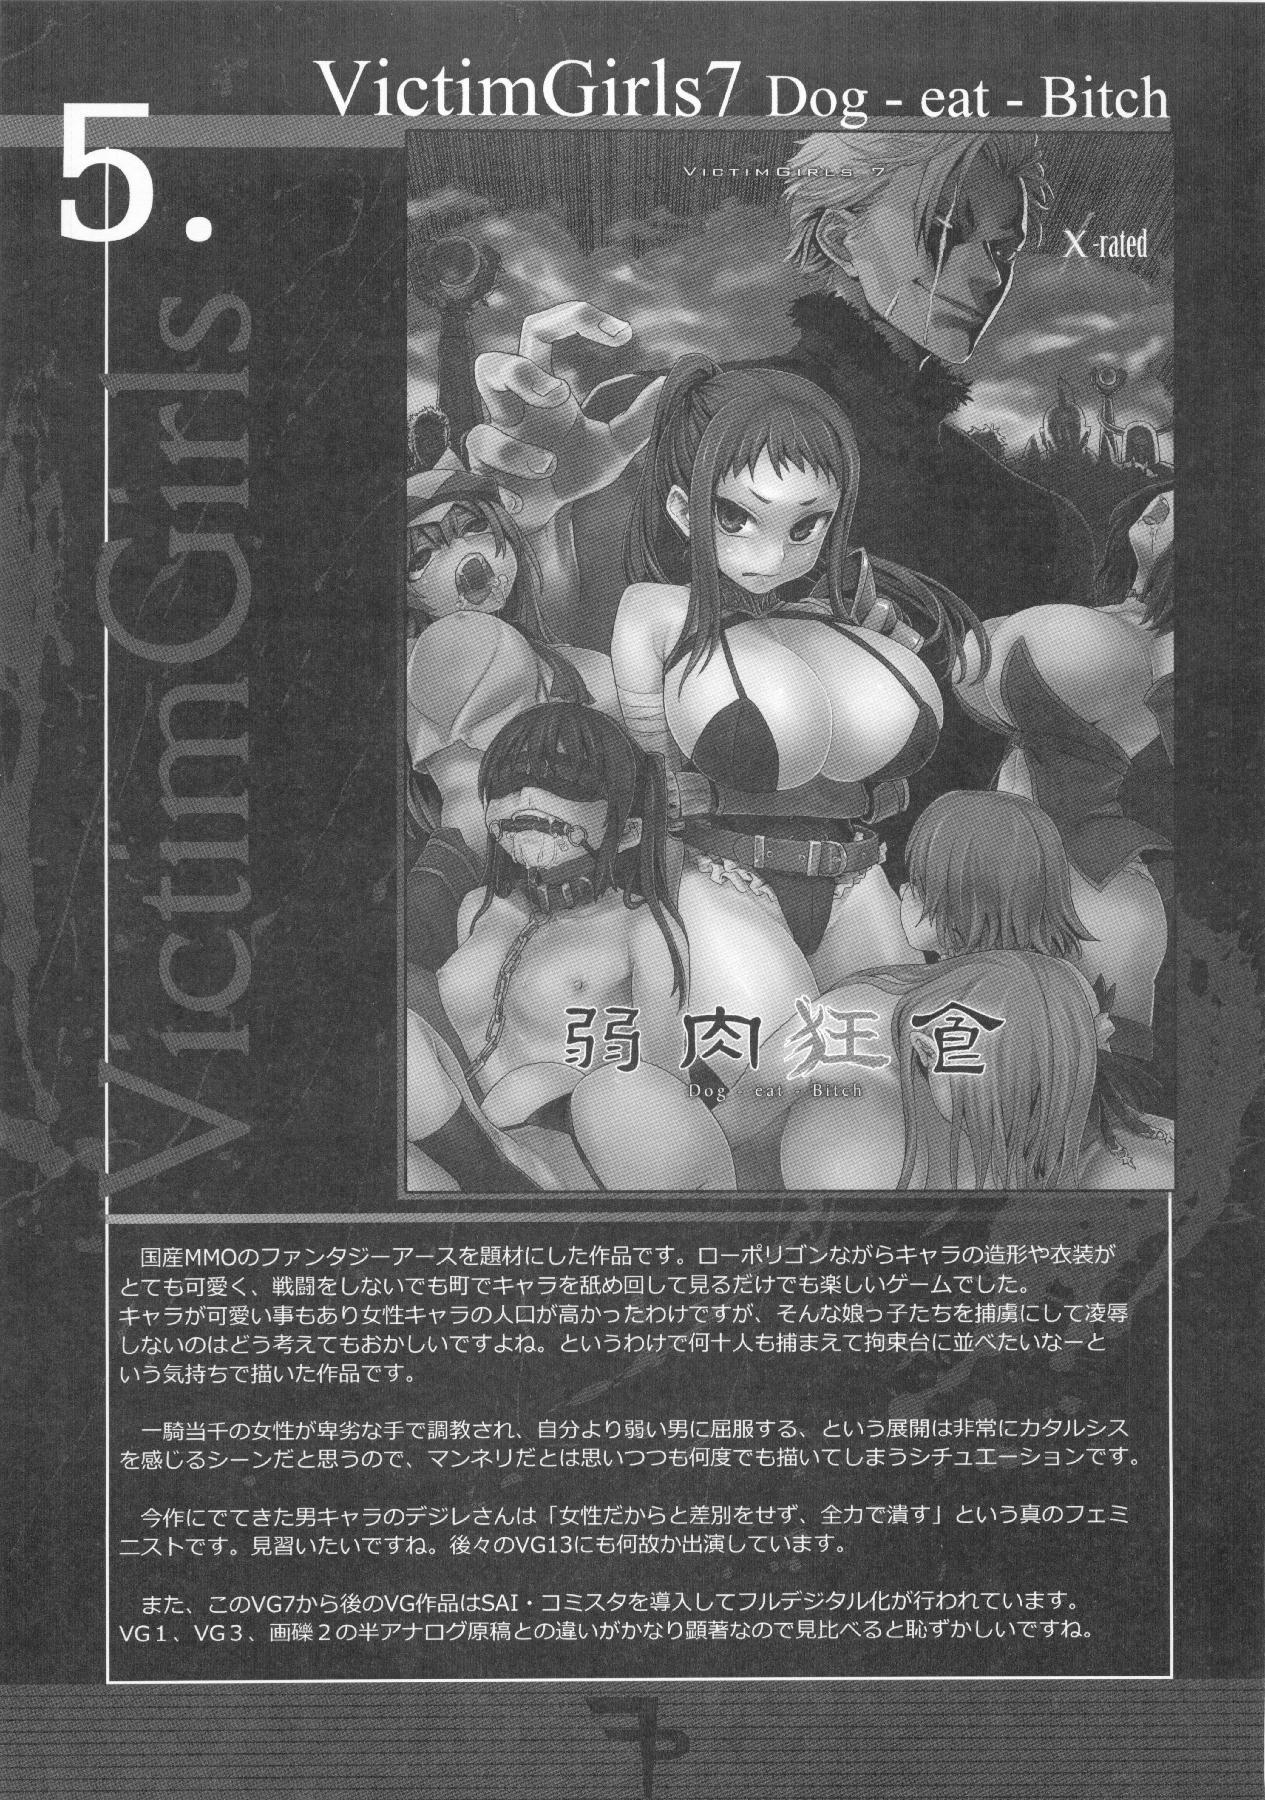 (C83) [Fatalpulse (Asanagi)] VictimGirls Compiled Vol.1 -Victimgirls Soushuuhen 1- MMO Game Selection (Various) 113